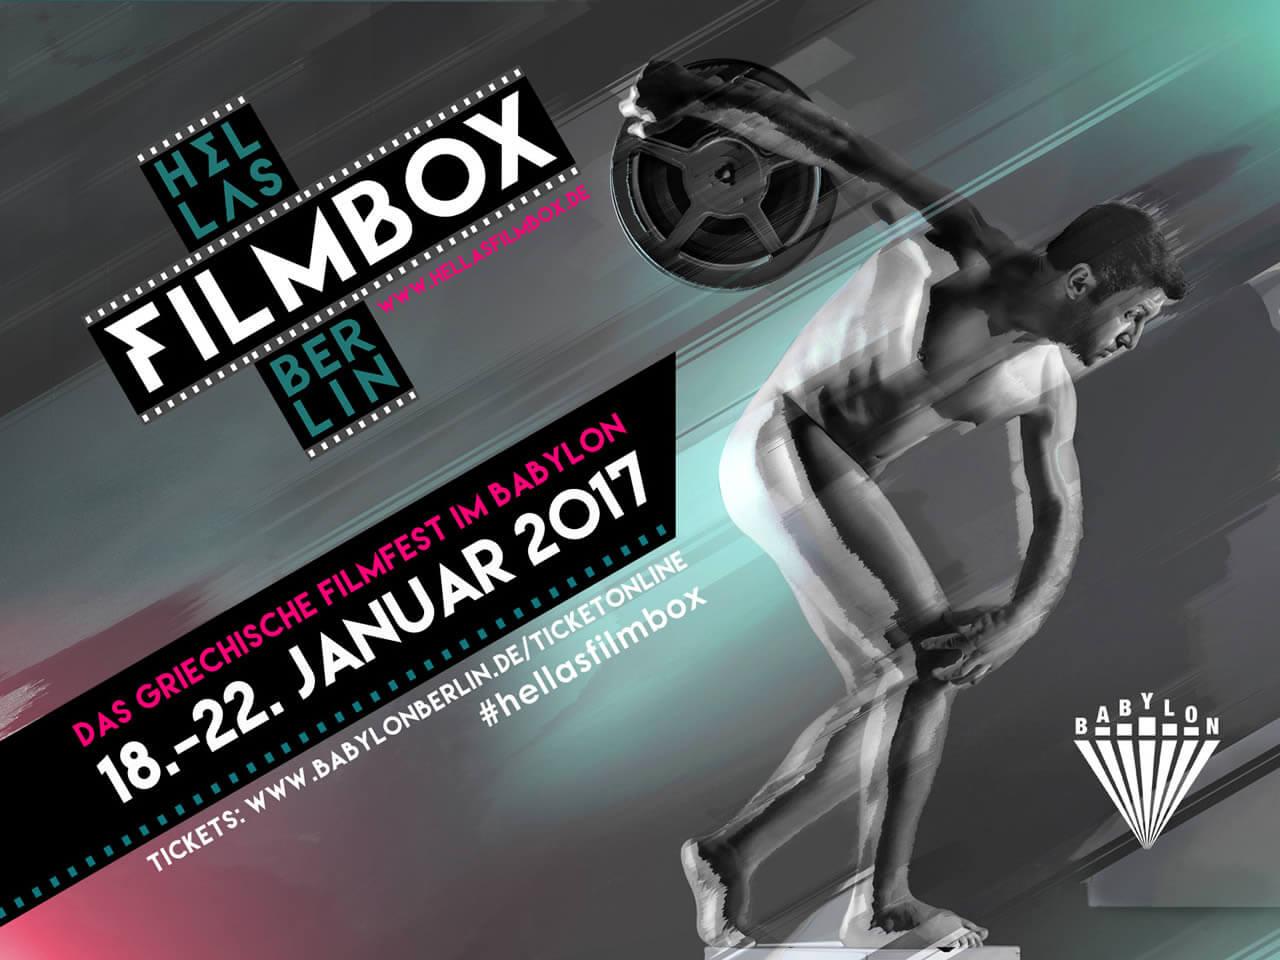 Hellas Filmbox Berlin